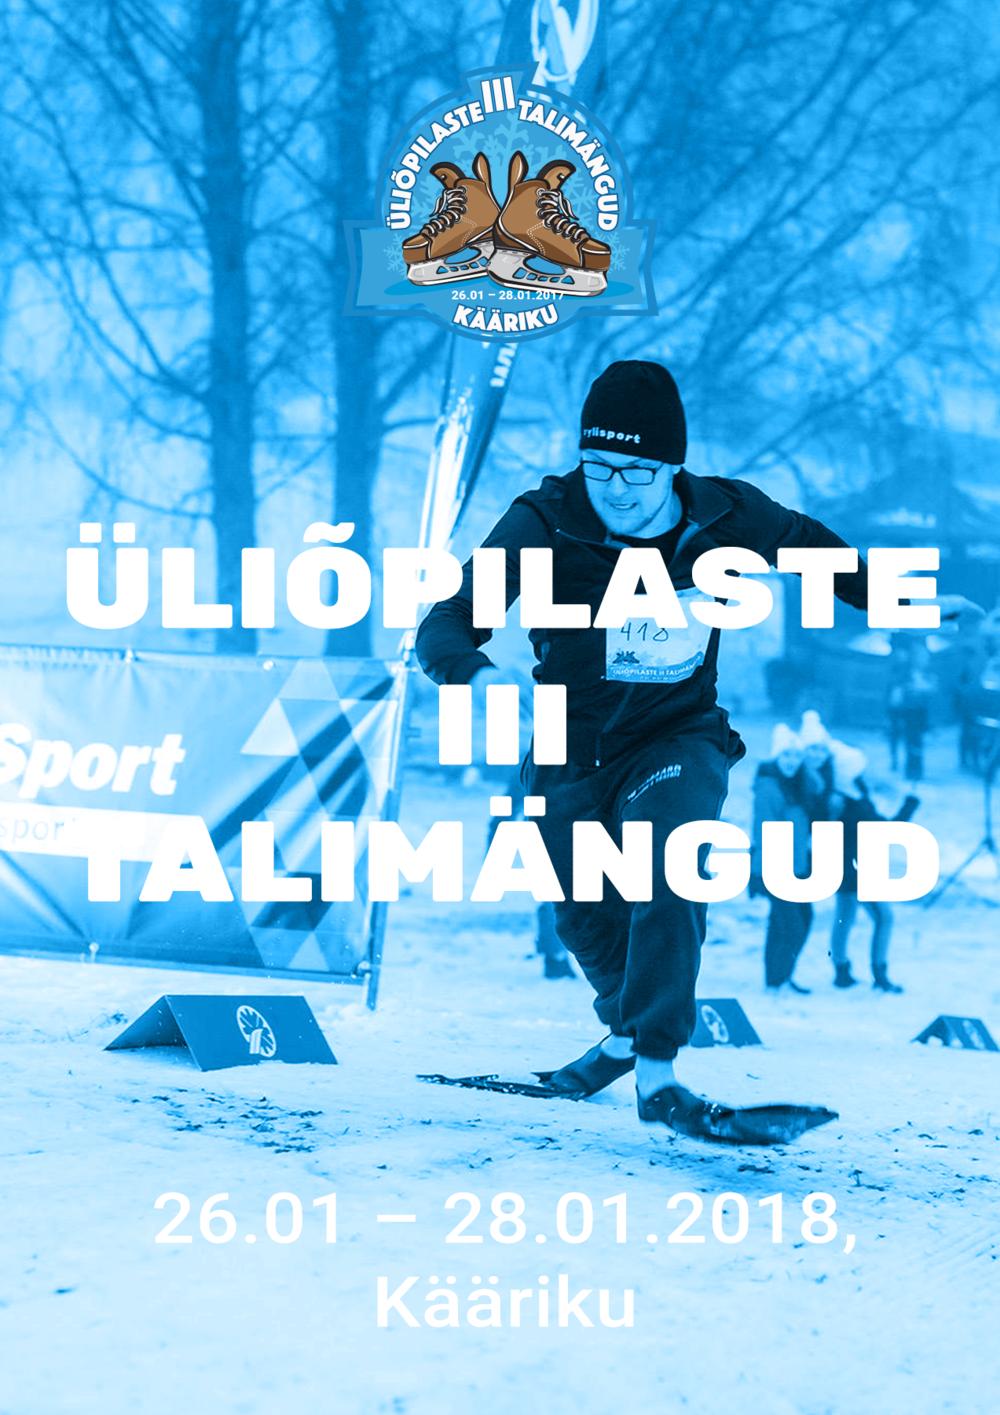 TLM III_avaleht.png